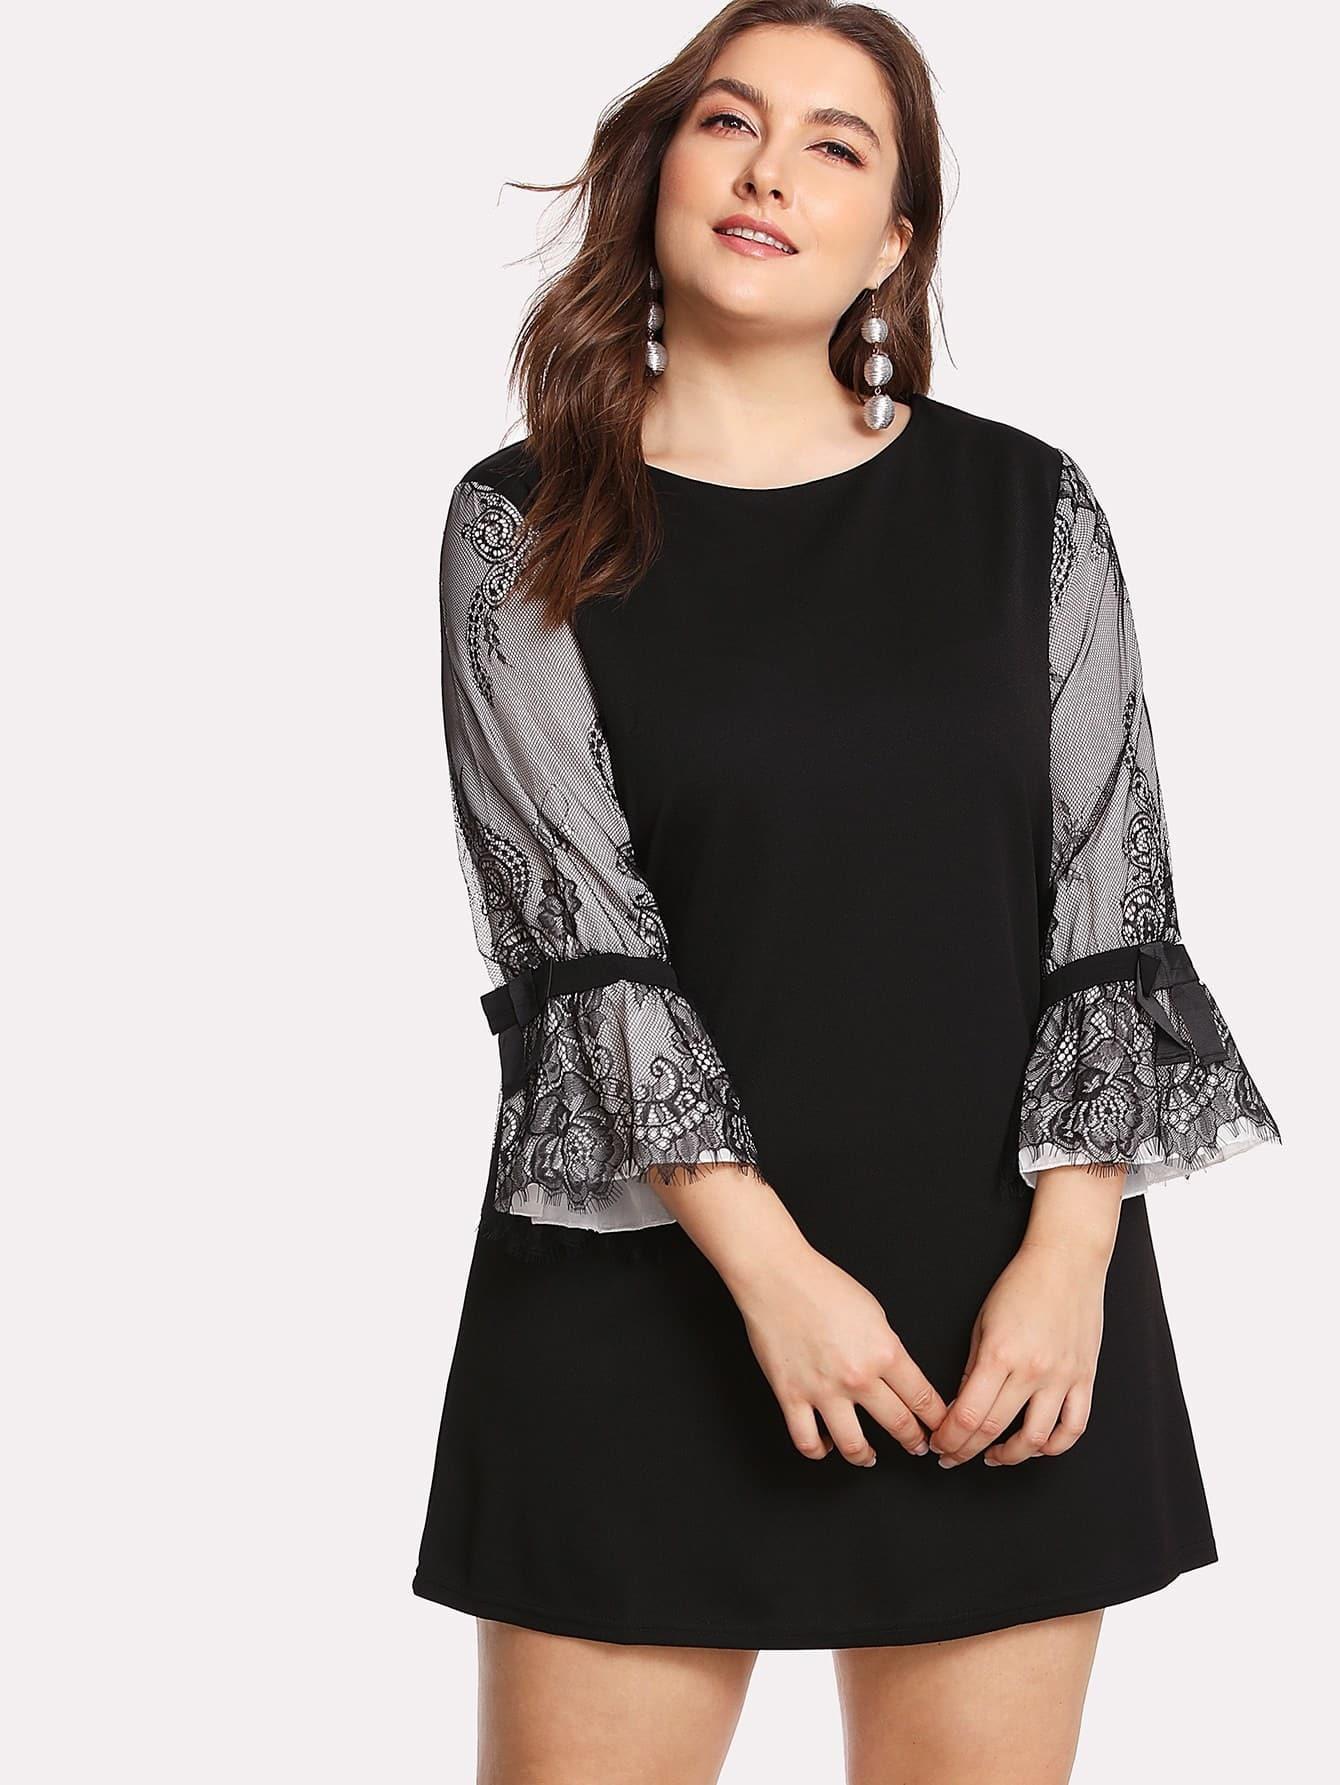 Contrast Lace Sleeve Dress